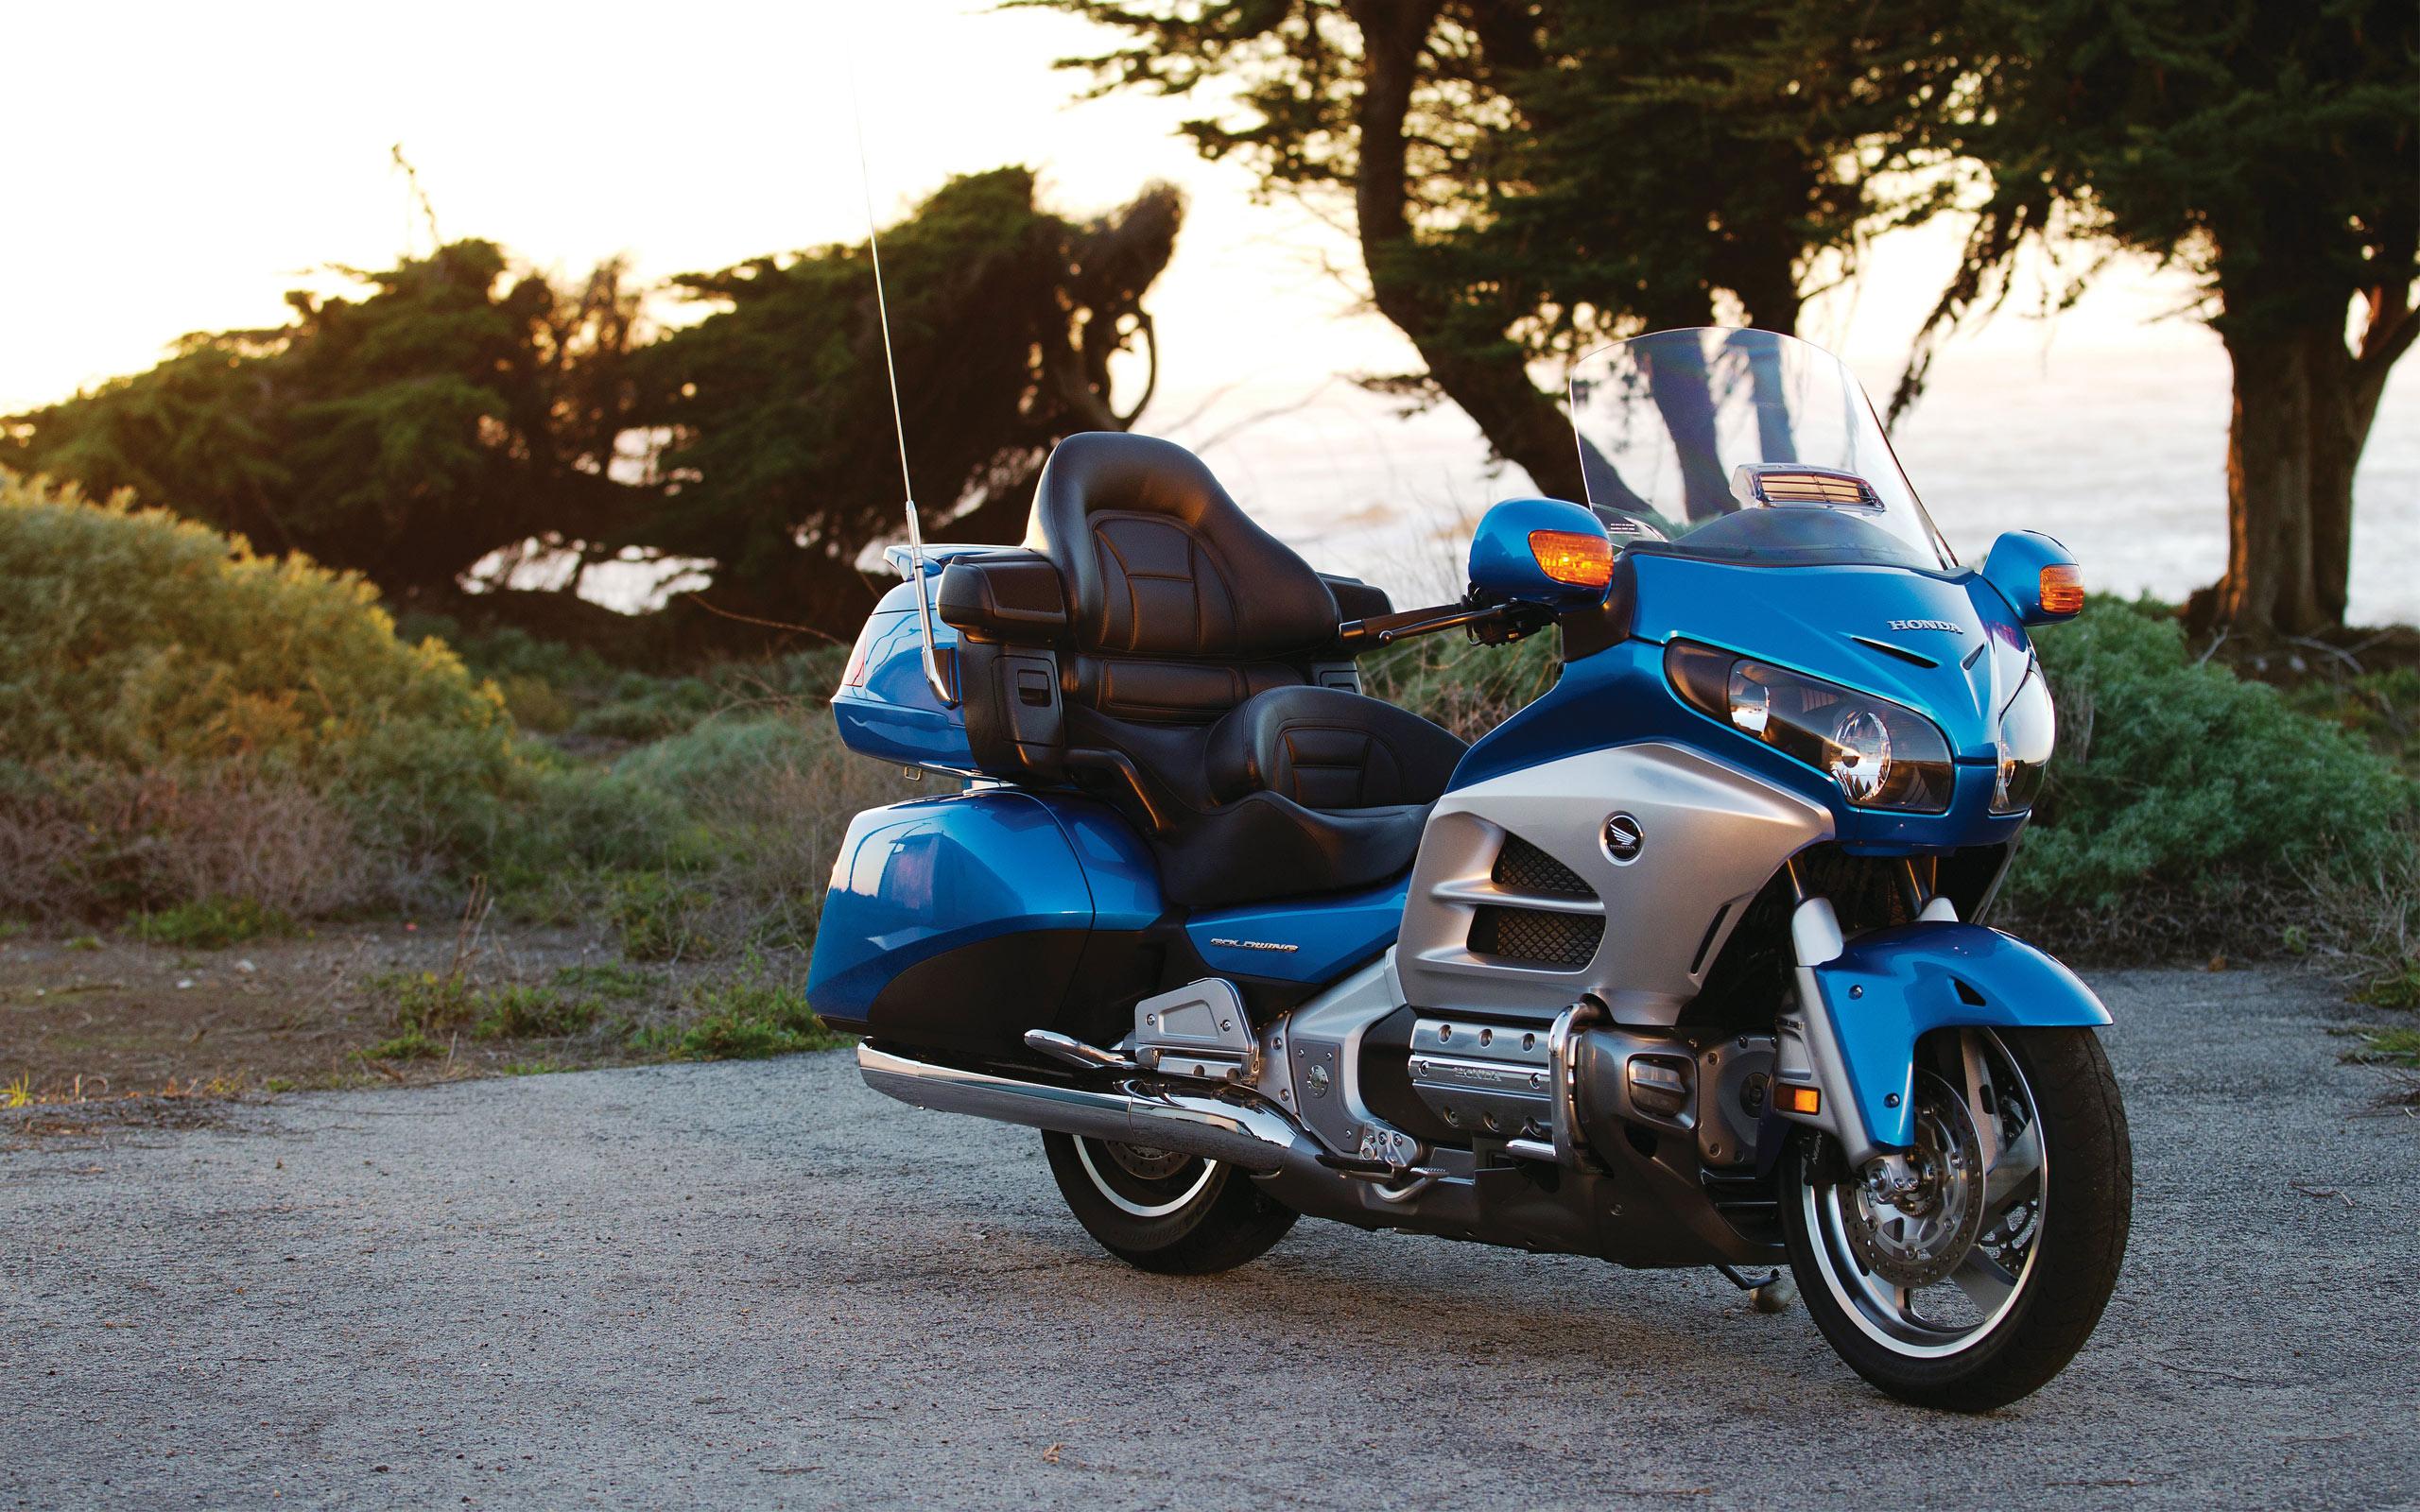 Honda Goldwing Blue Bike Background Wallpapers 66800 2560x1600px 2560x1600